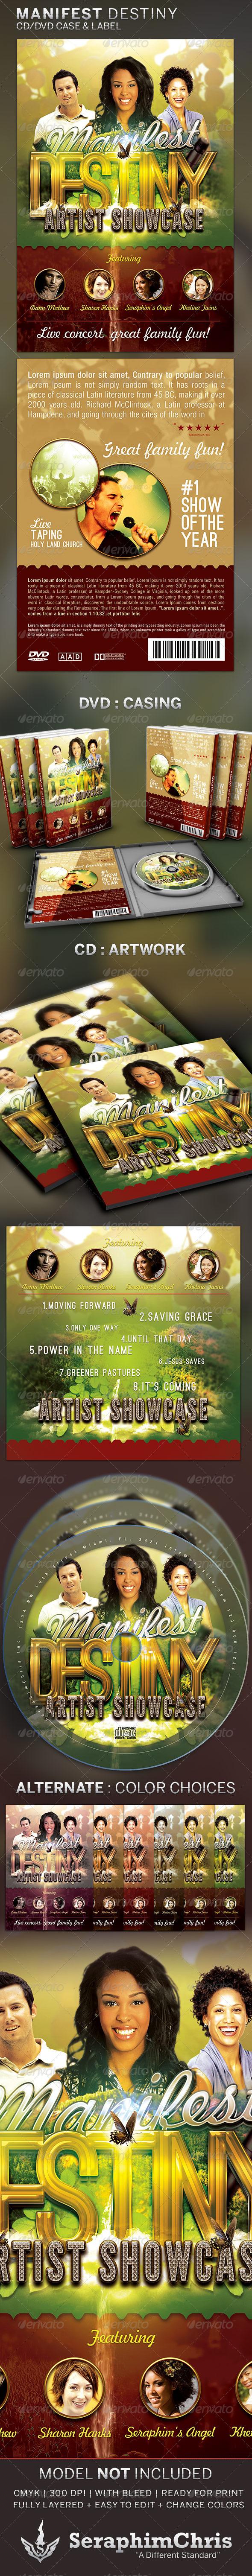 Manifest Destiny: CD/DVD Template - CD & DVD Artwork Print Templates